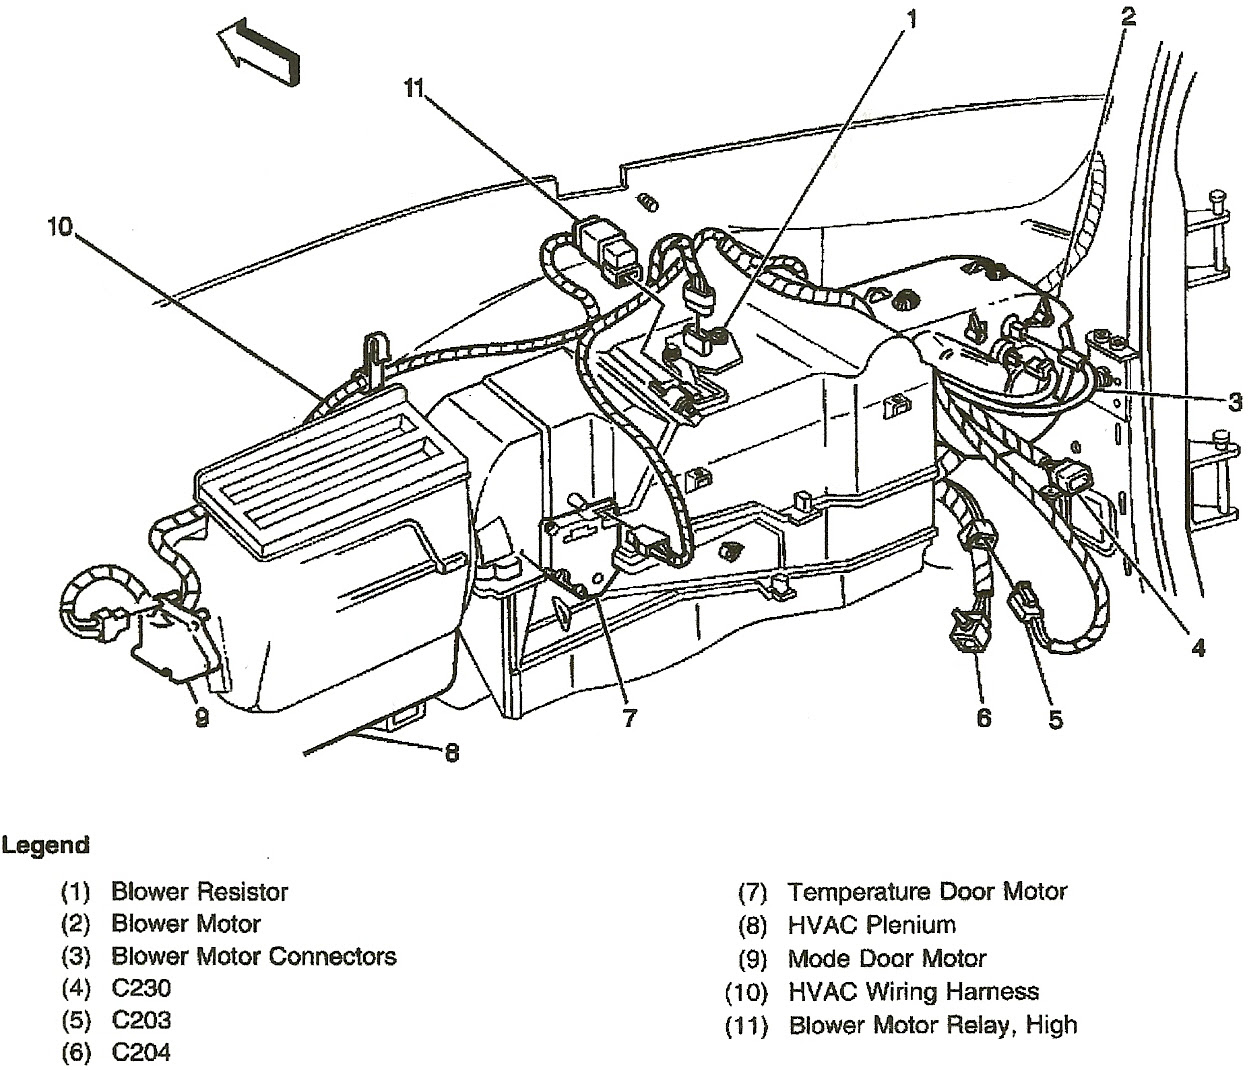 2007 Tahoe Engine Diagram Kubota Rtv 1100 Engine Diagram For Wiring Diagram Schematics